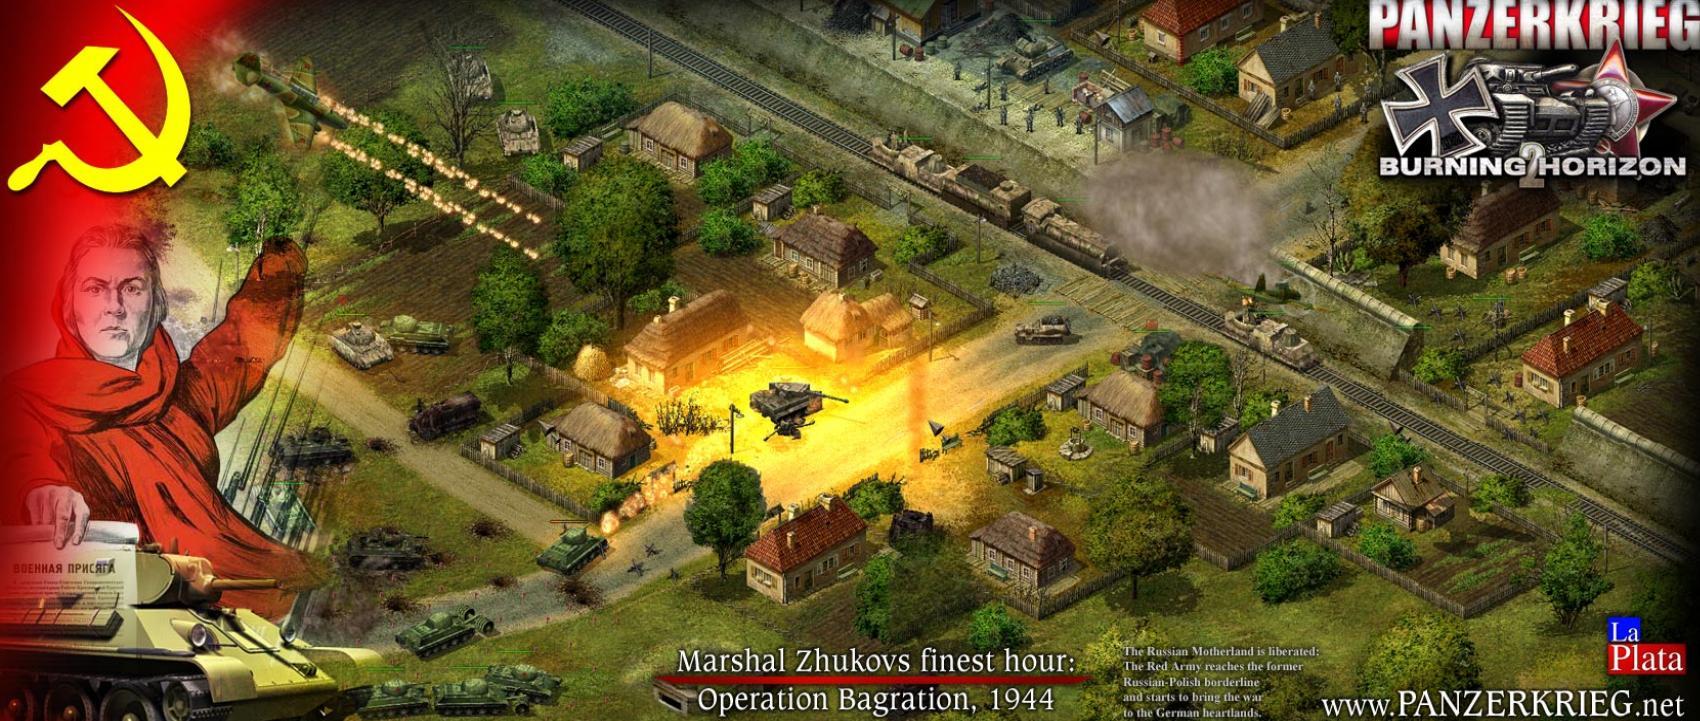 http://www.igroport.ru/games_img/67998_panzerkrieg_burning_horizon_2-11.jpg